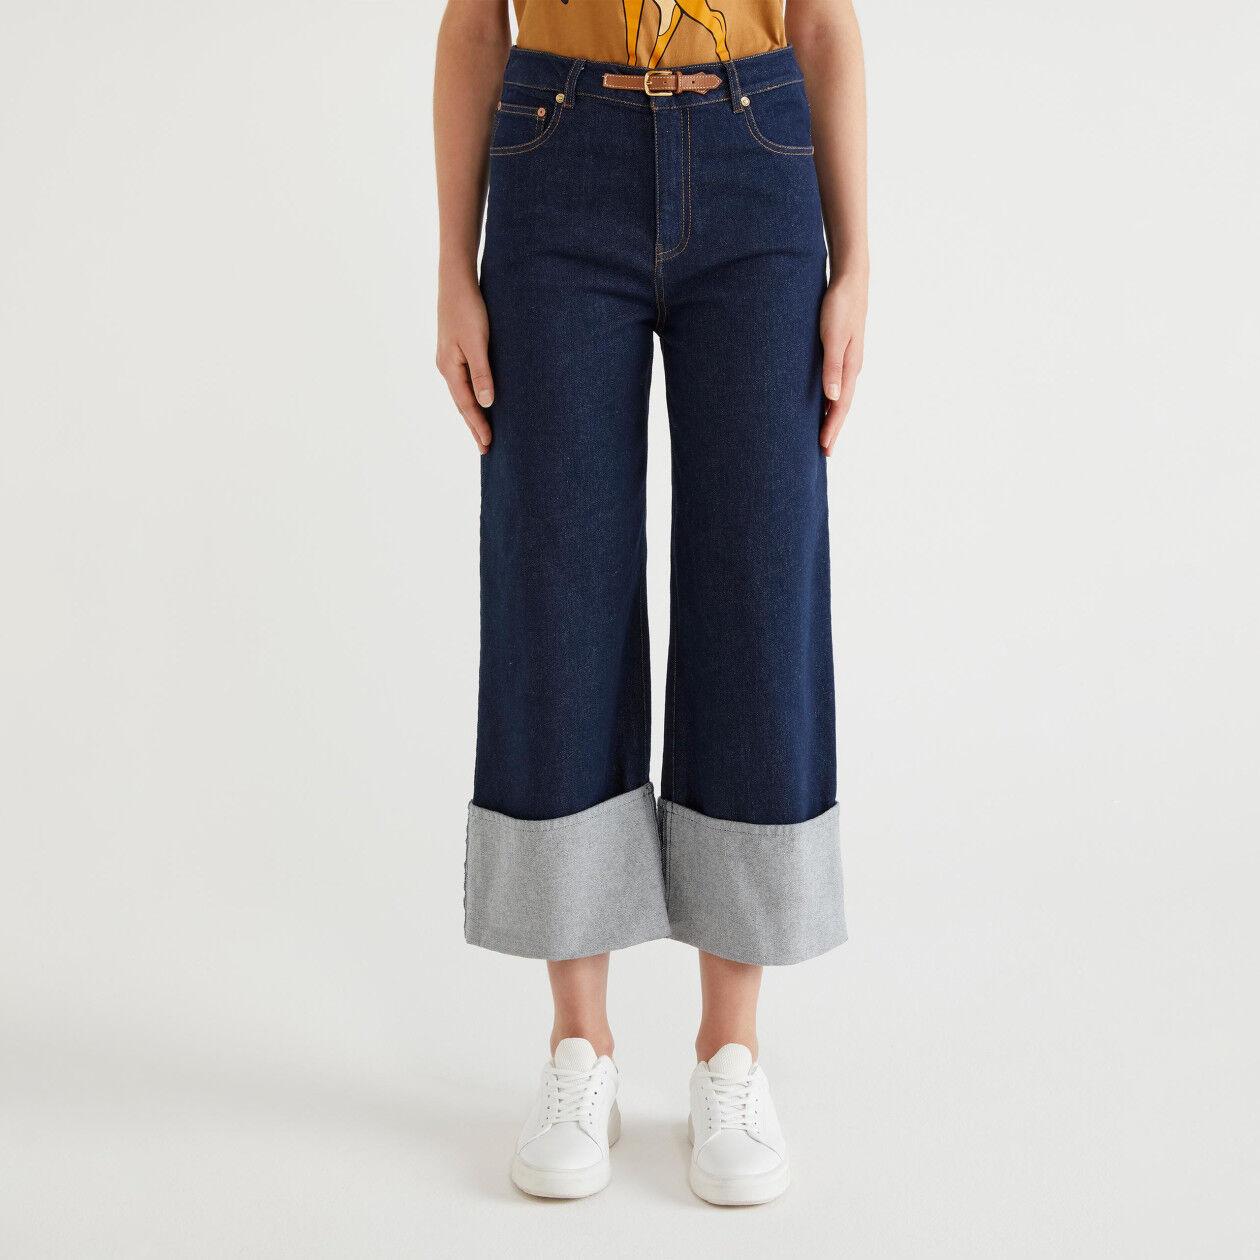 Pantalon en denim avec revers